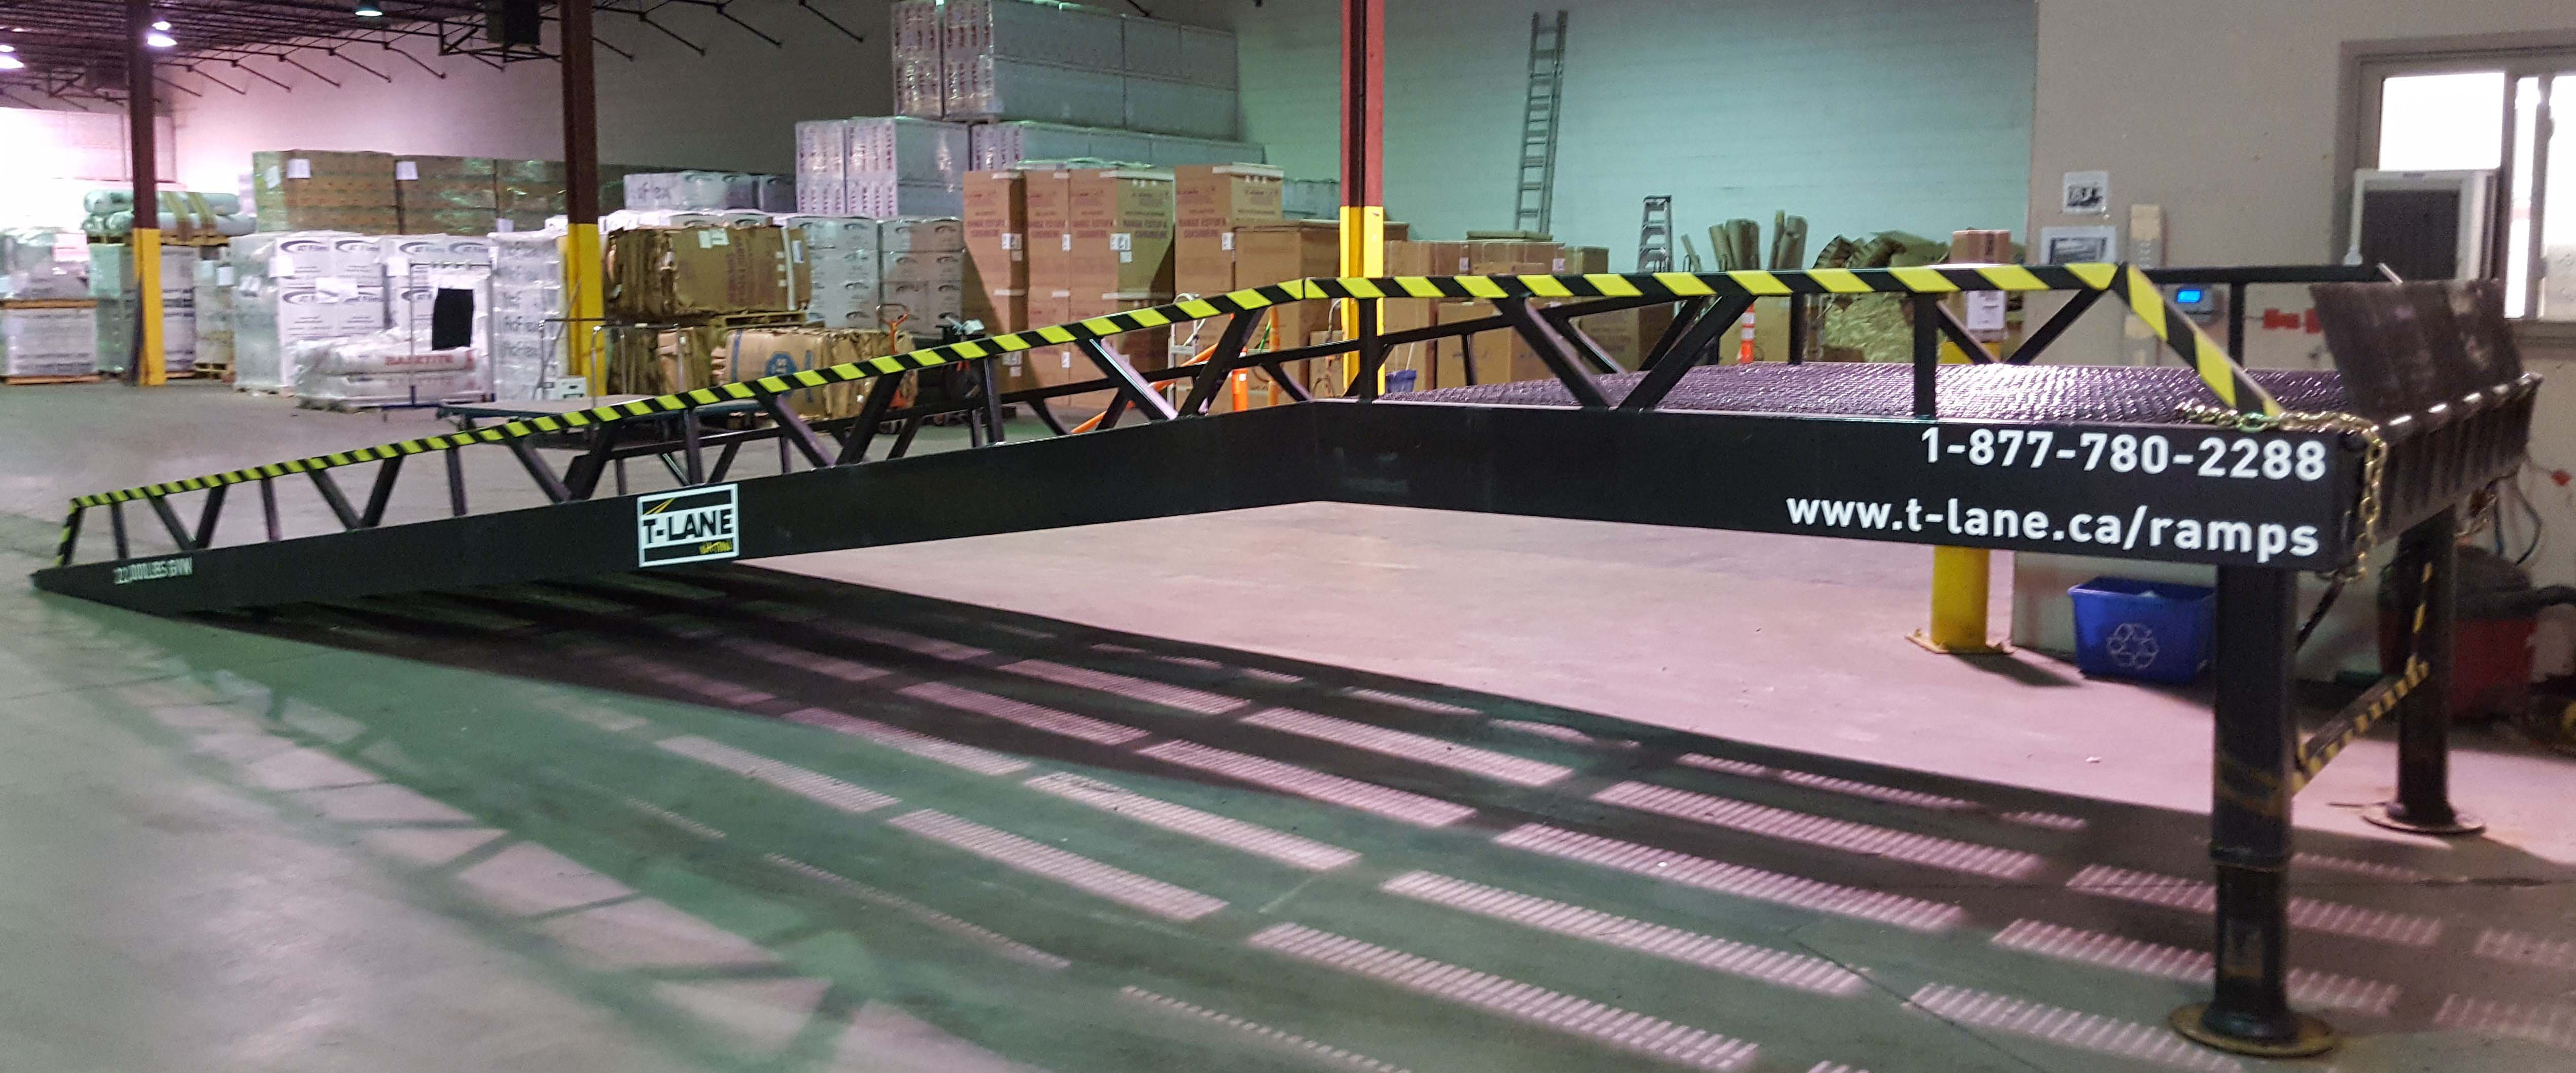 Wide Range Transportation Portable Loading Dock Ramp